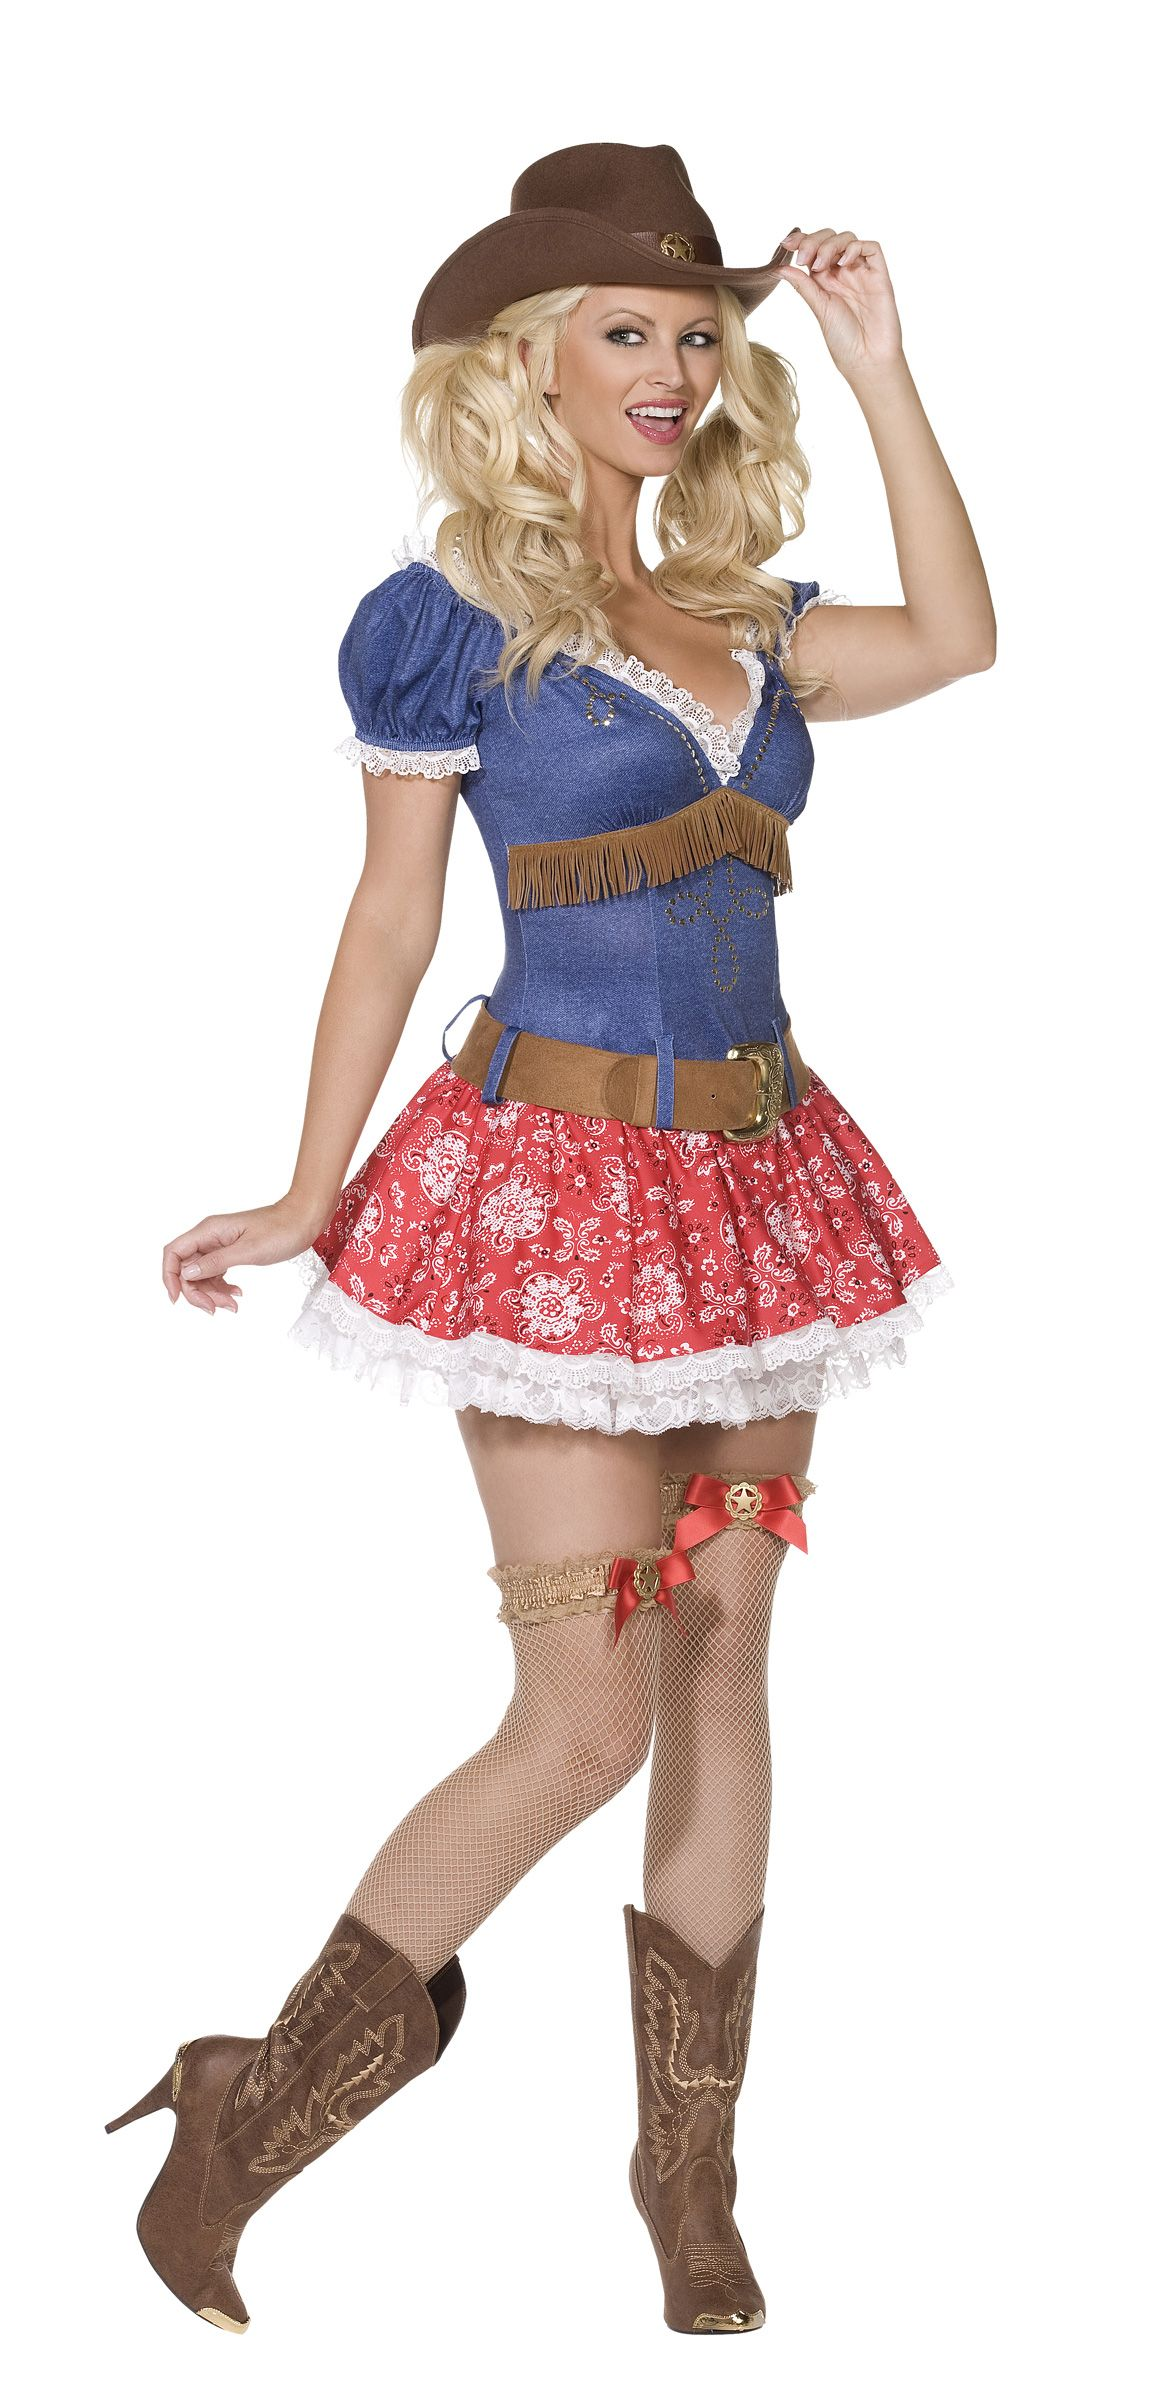 cow girl   Cowgirl costume for women  Vegaoo Adults Costumes  sc 1 st  Pinterest & cow girl   Cowgirl costume for women : Vegaoo Adults Costumes ...